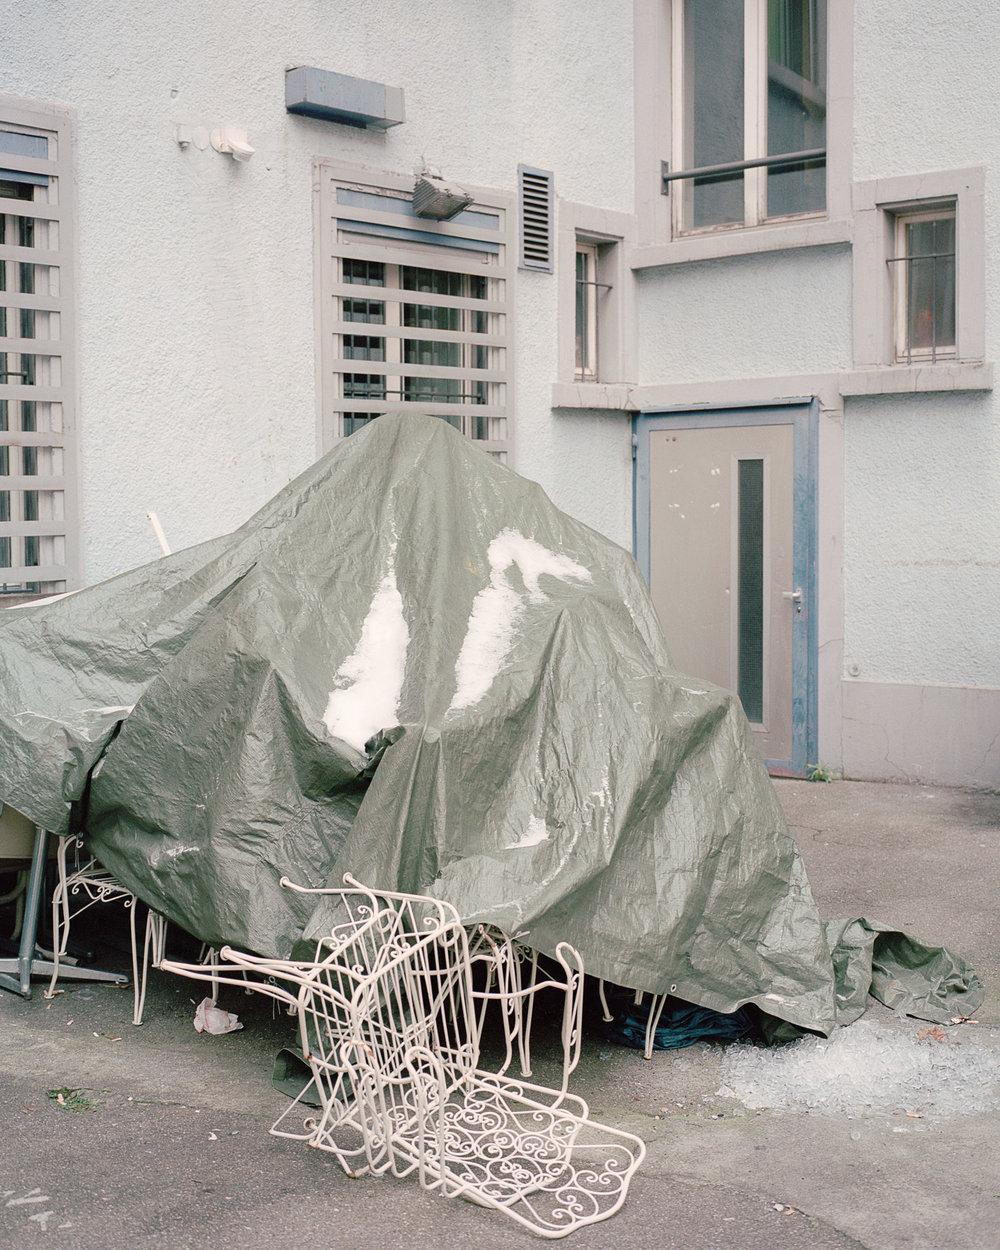 Jonas Landolt Fotografie Cover Up